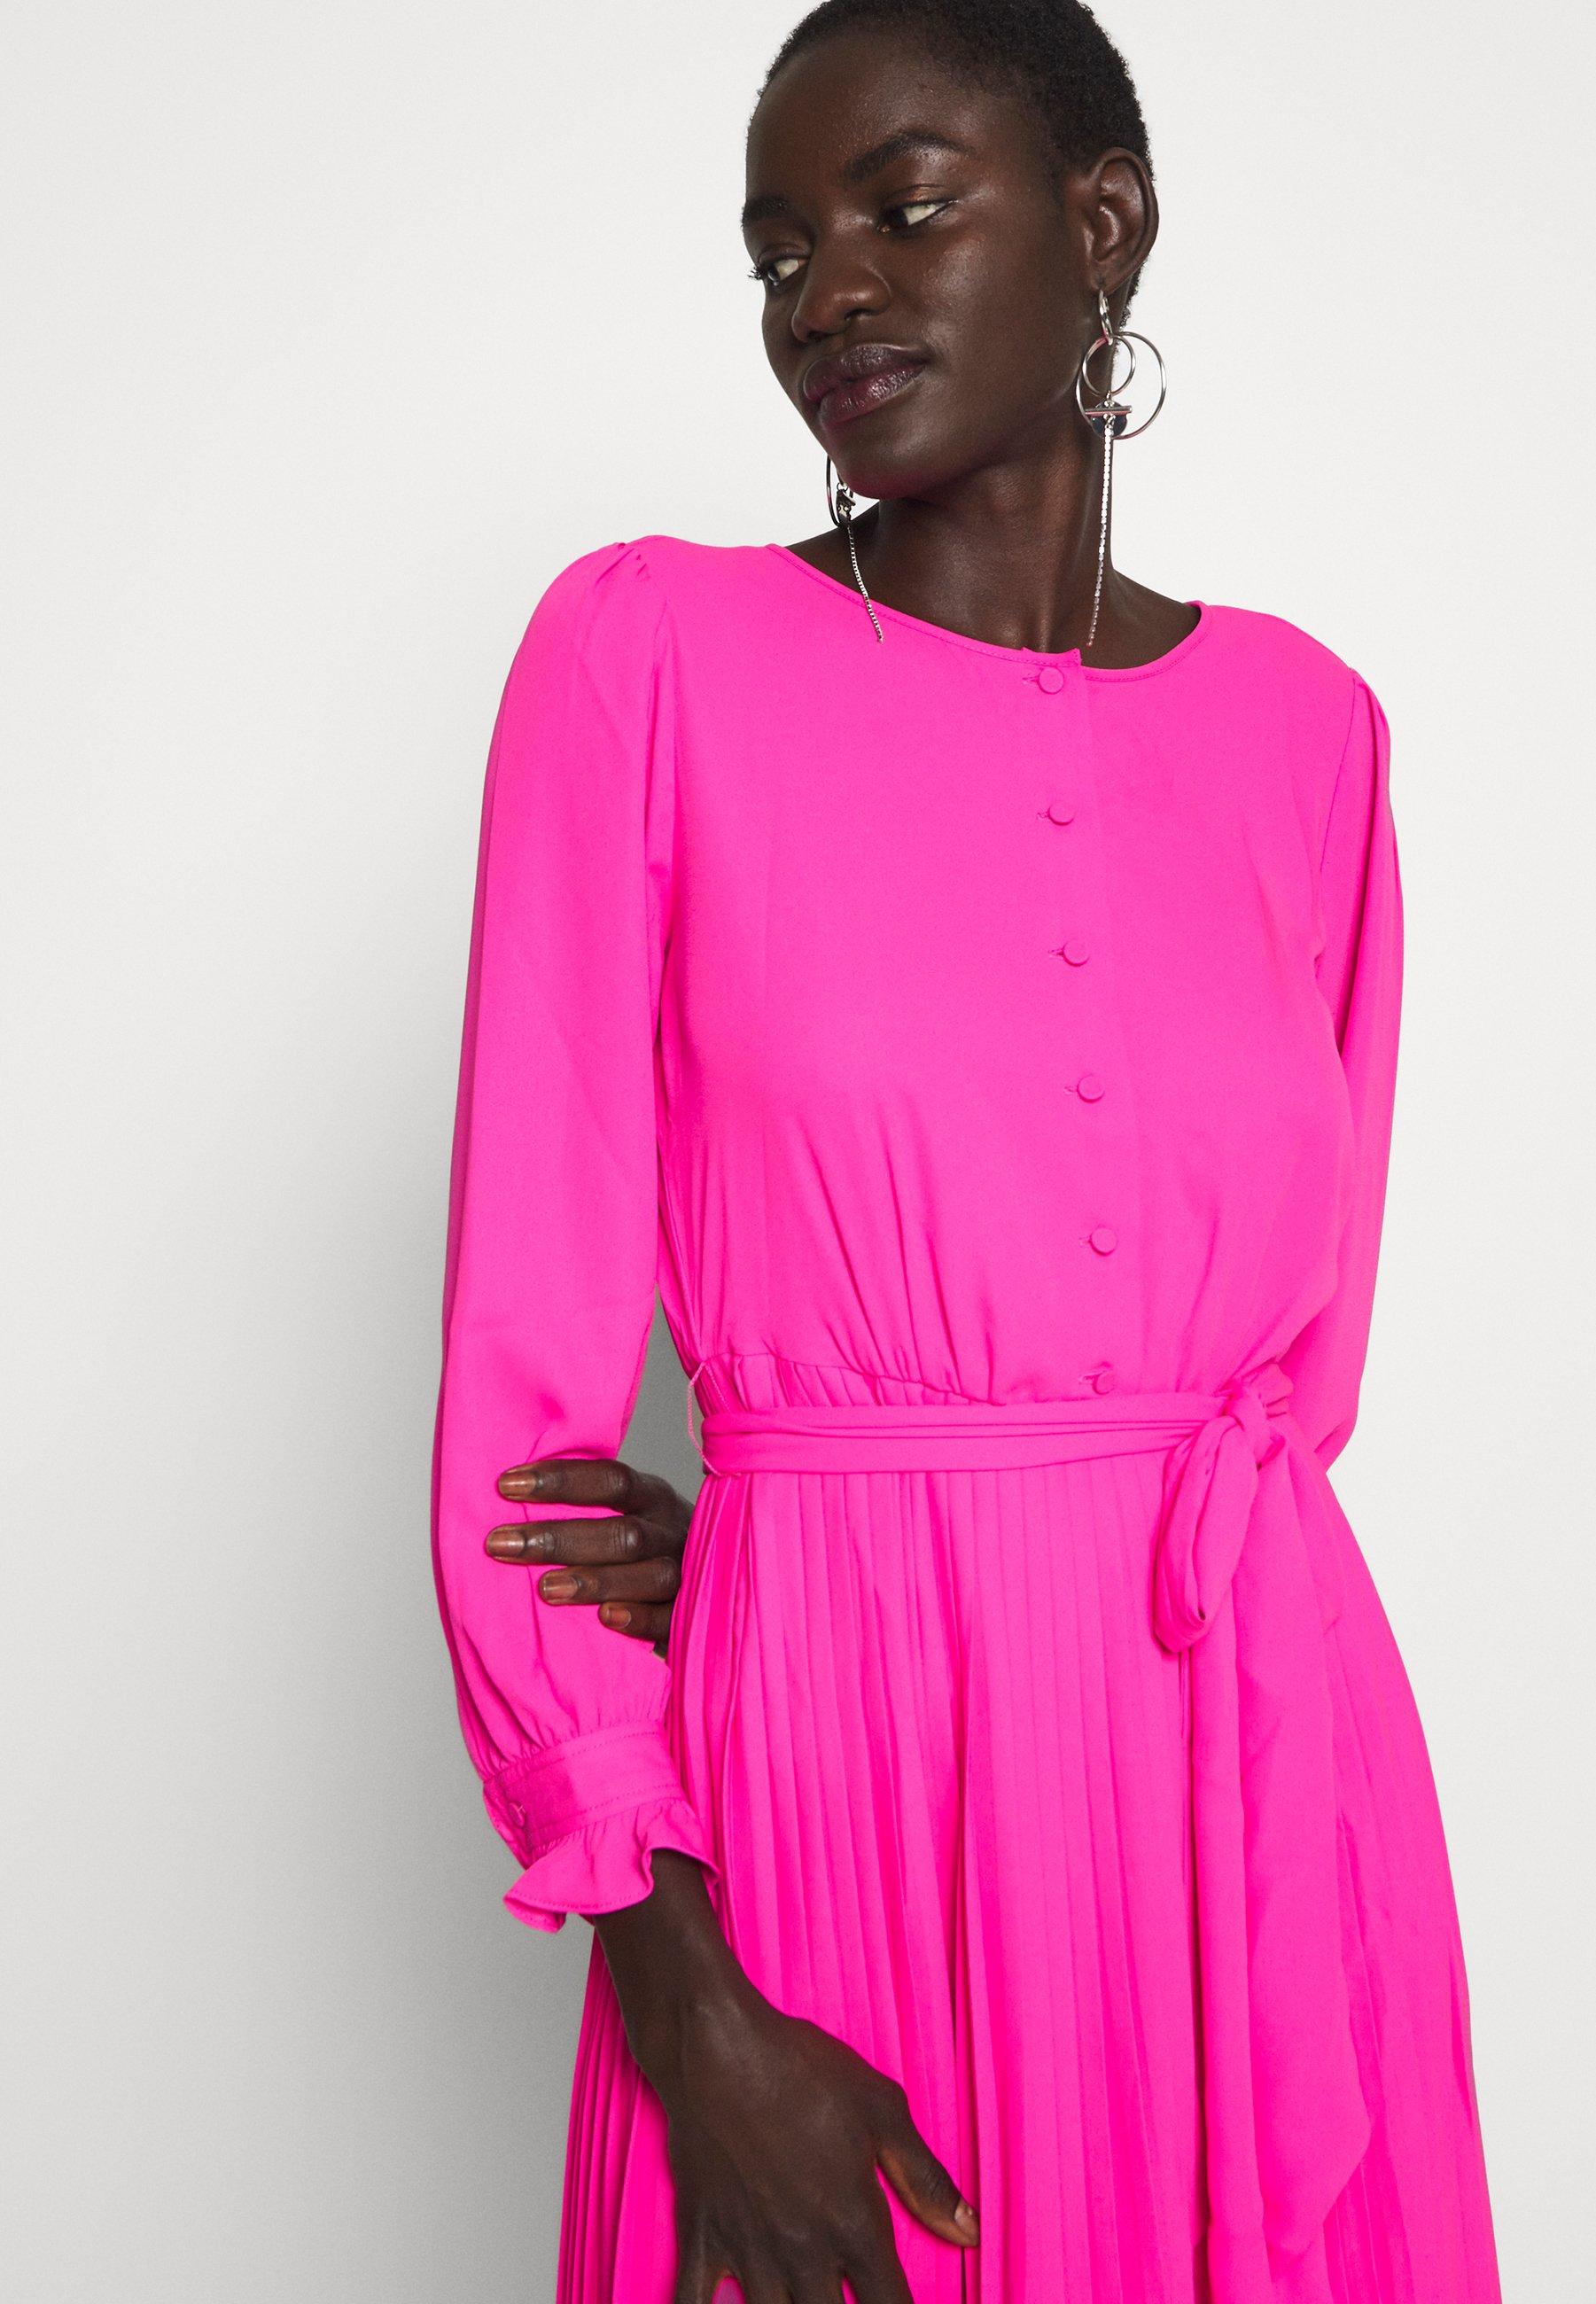 J.crew Tall Solid Carly Dress - Skjortekjole Neon Flamingo